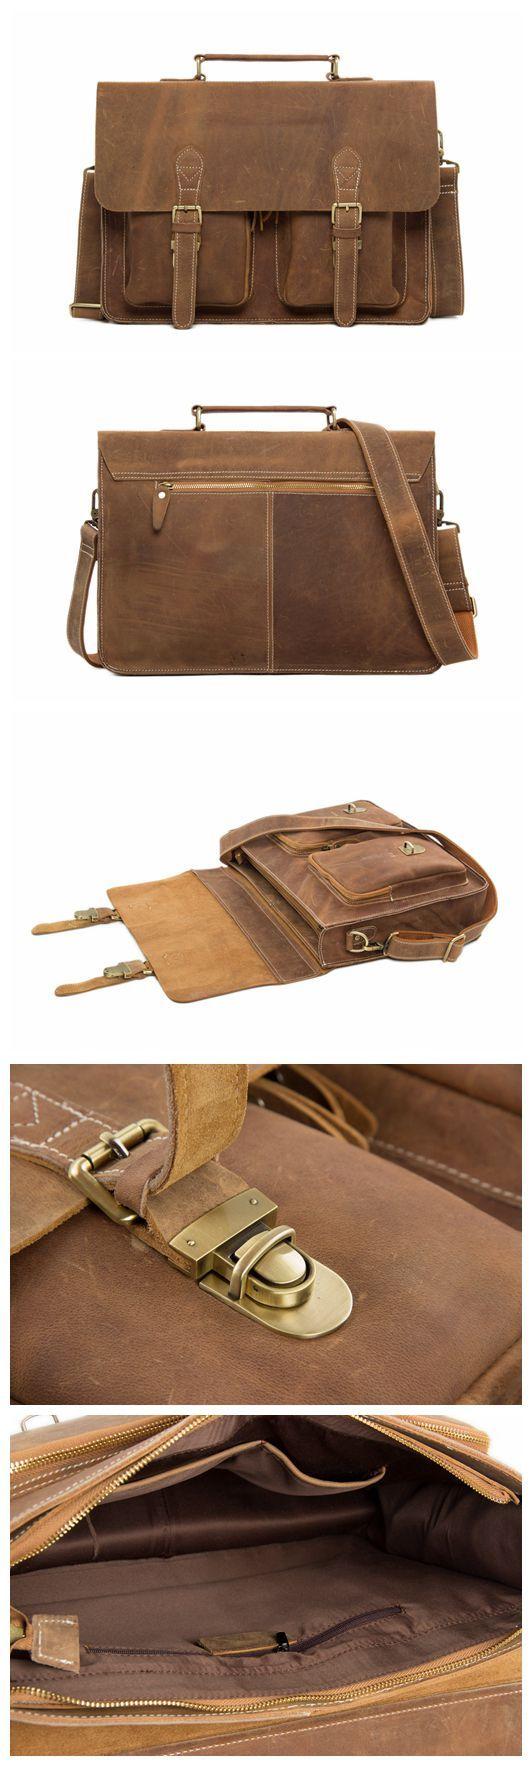 Laptop bags office depot - Handcrafted Top Grain Genuine Leather Laptop Briefcase Business Handbag Men Messenger Bag 0344